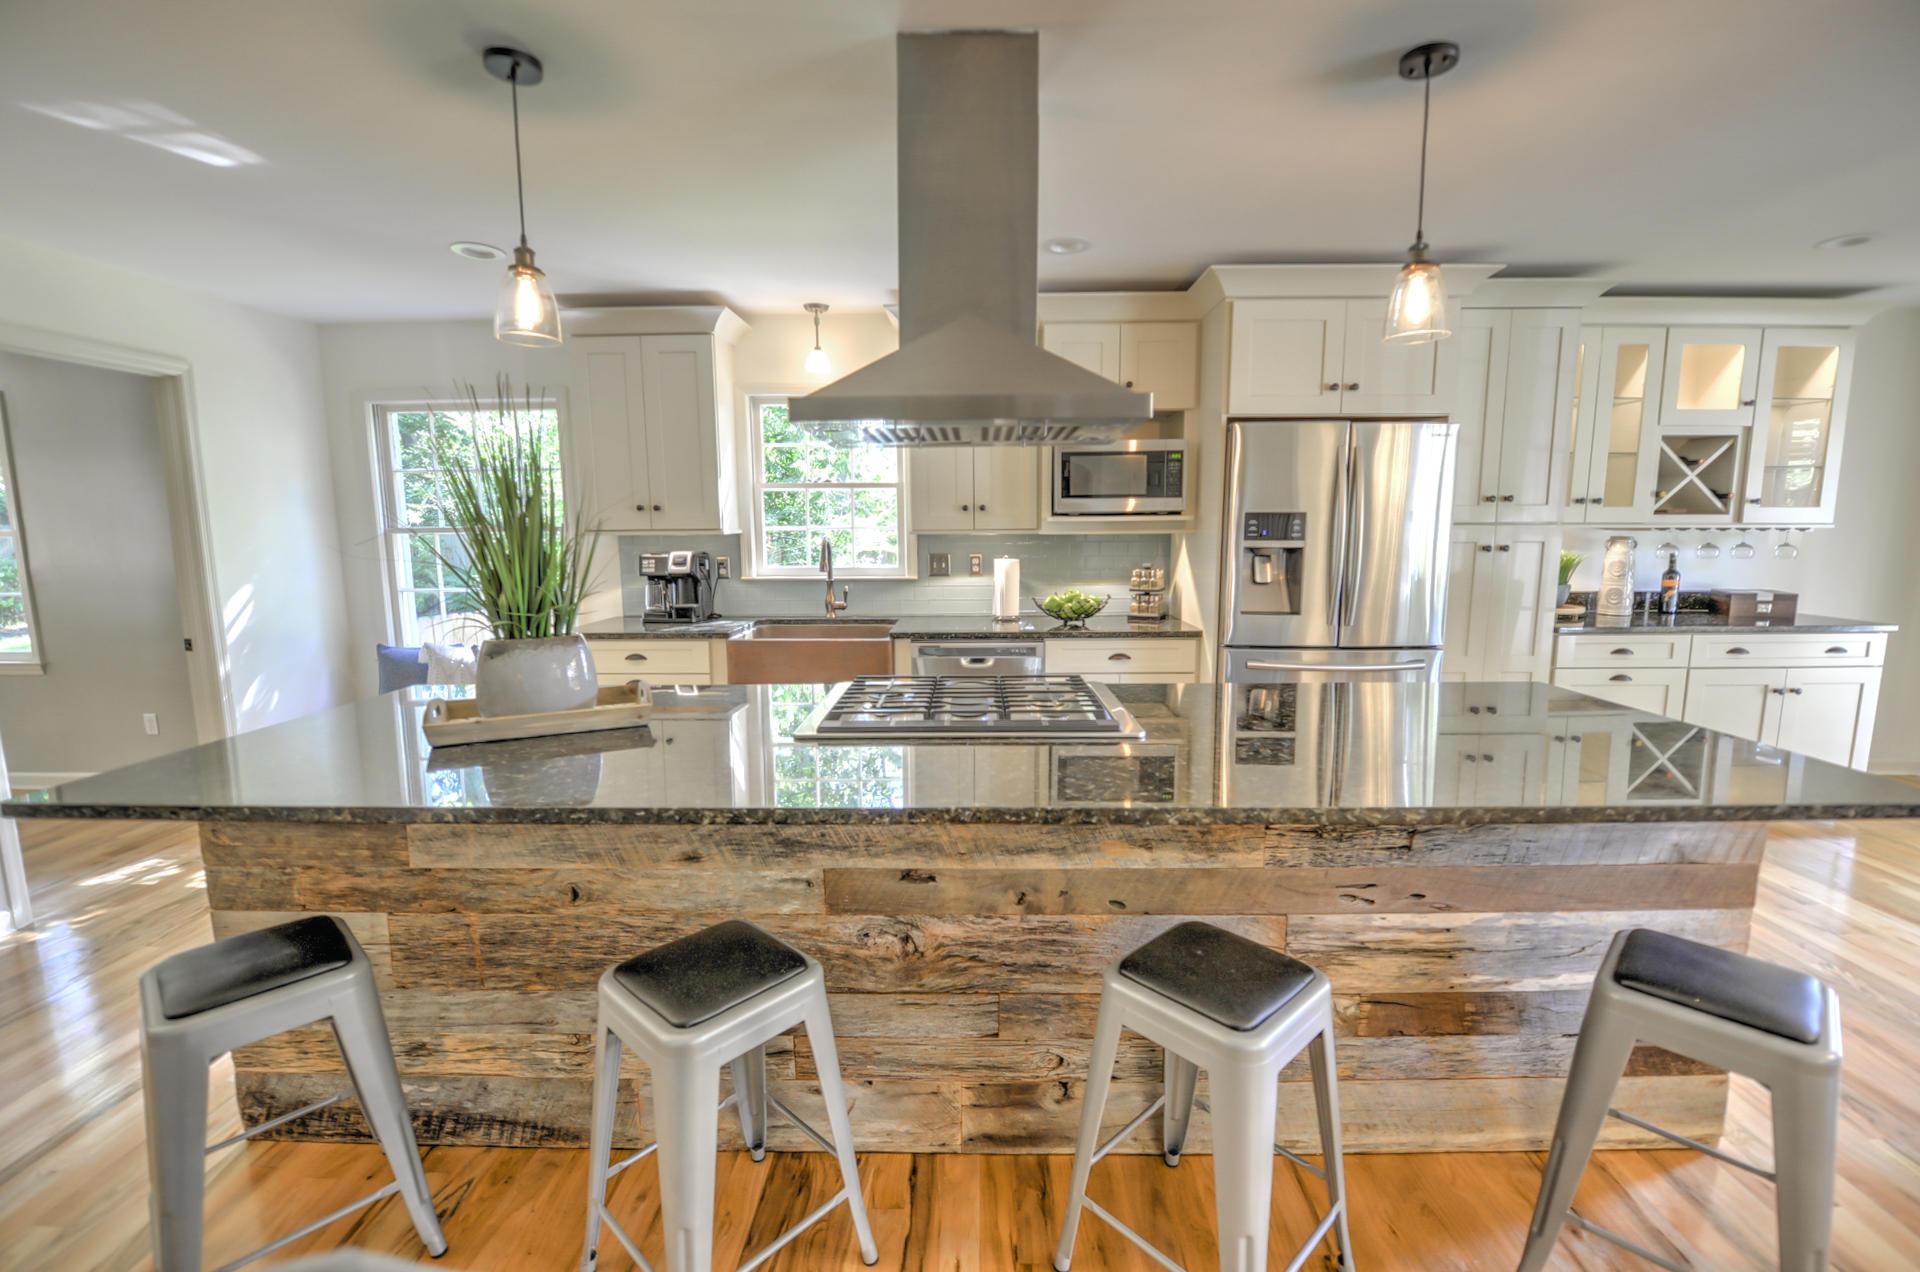 Shemwood II Homes For Sale - 1017 Jack Snipe, Mount Pleasant, SC - 12